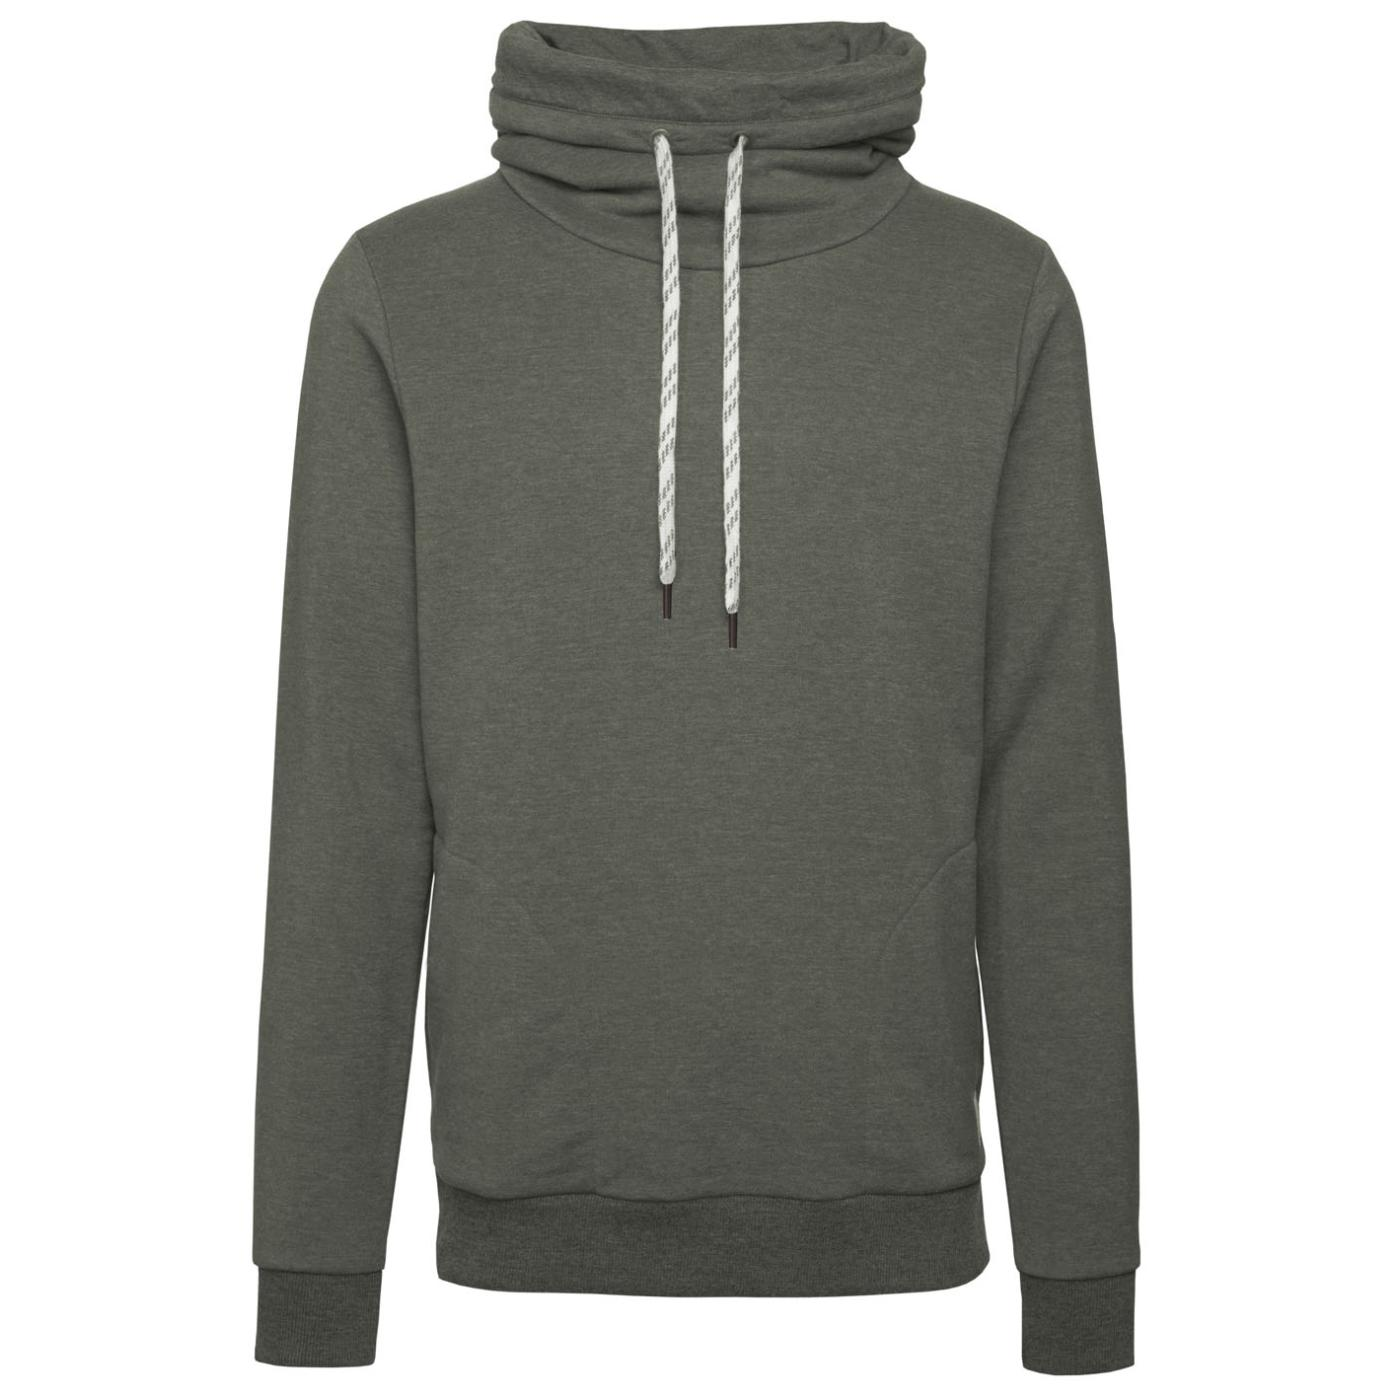 15-11-07-Sweater11